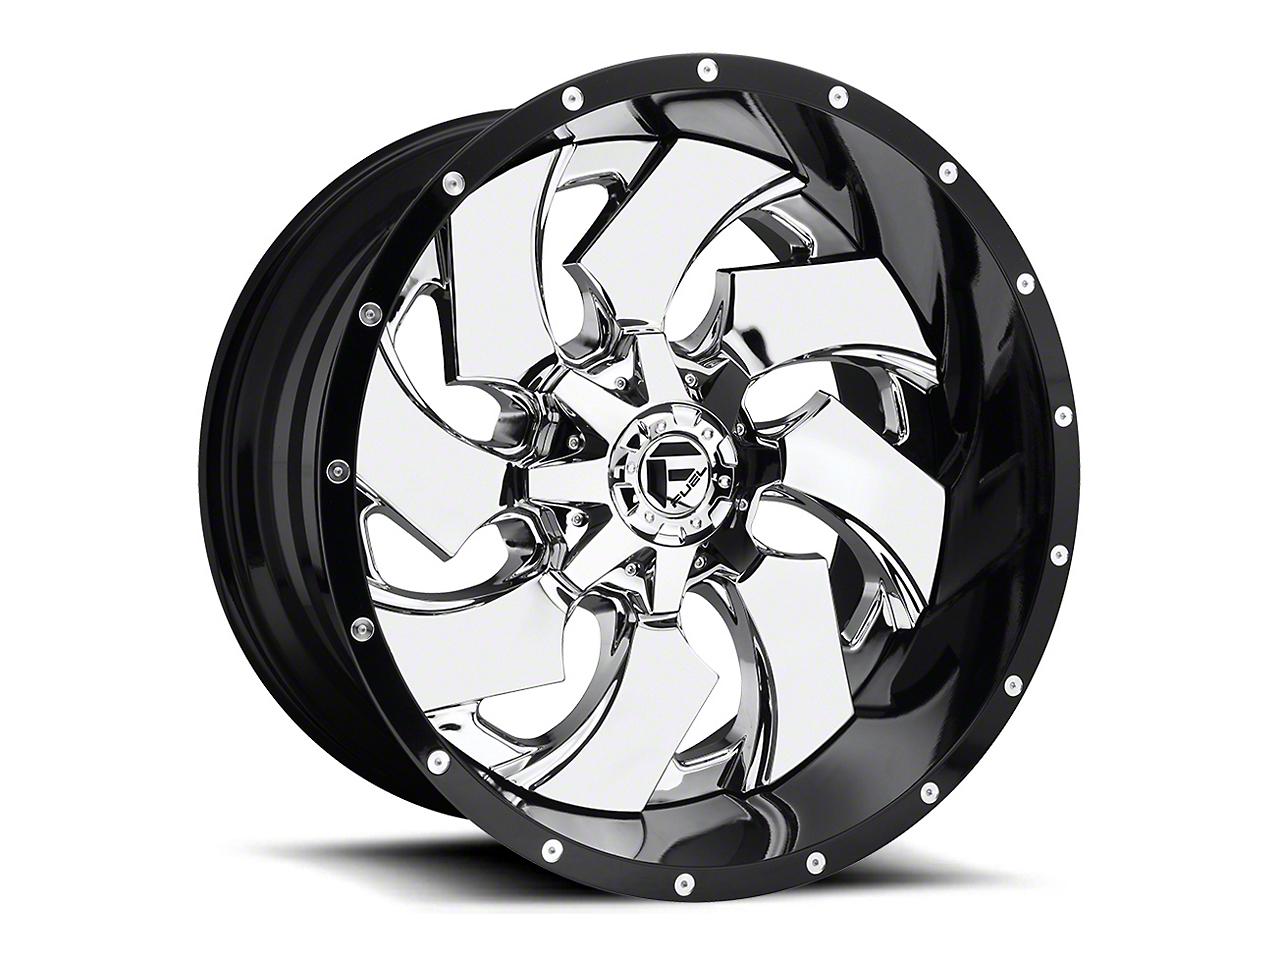 Fuel Wheels Cleaver Chrome 5-Lug Wheel - 24x16 (02-18 RAM 1500, Excluding Mega Cab)